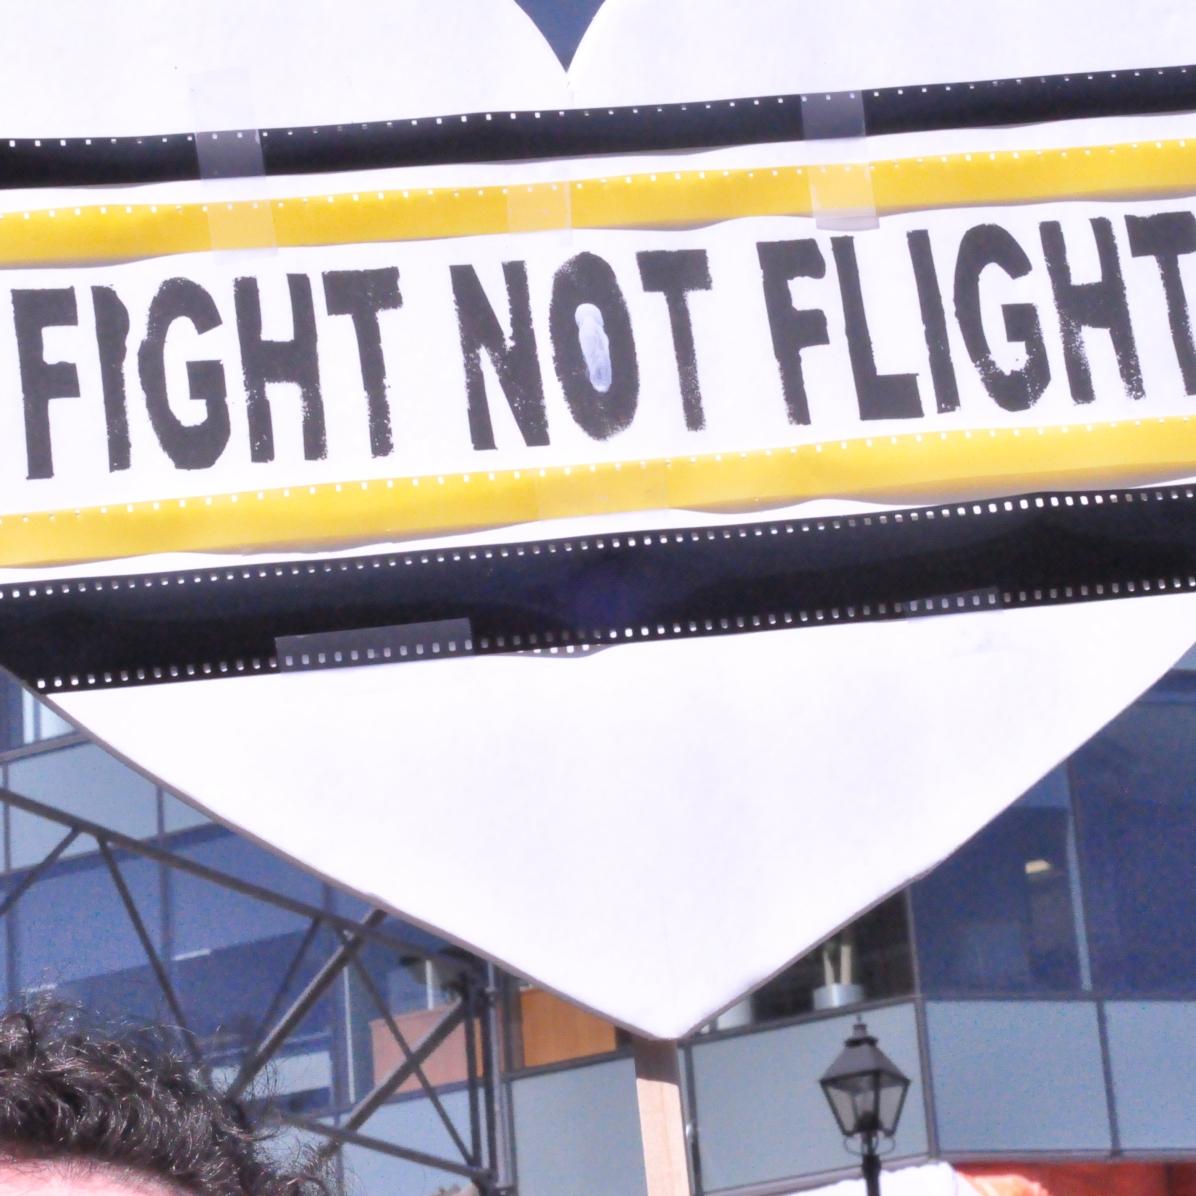 Protesta alrededor de la Province House NS. Foto: Yann Lobainahttps://en.wikipedia.org/wiki/Province_House_(Nova_Scotia)